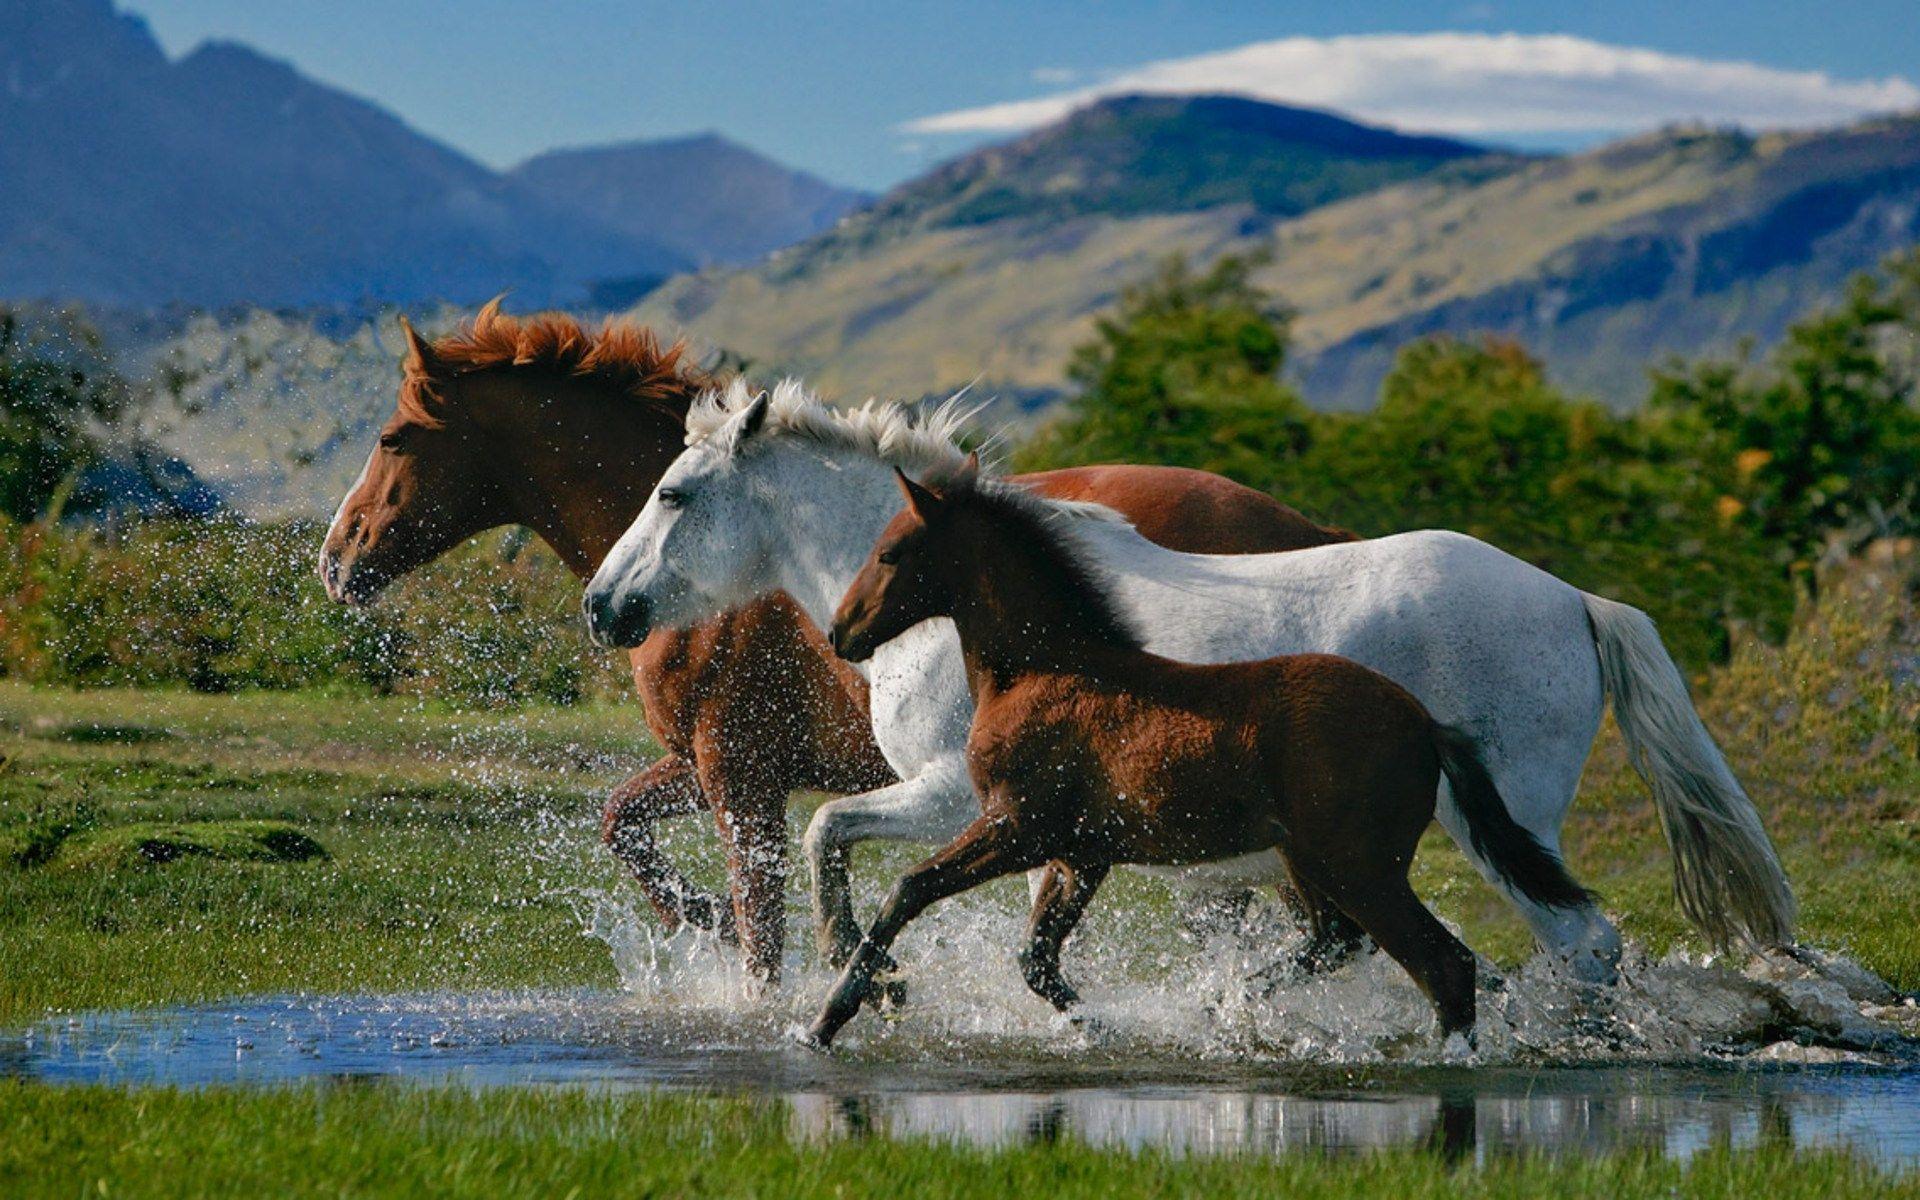 Most Inspiring Wallpaper Horse Scenery - 2ef500bec482dd9ce7e2ce5a5f98442b  Trends_71648.jpg